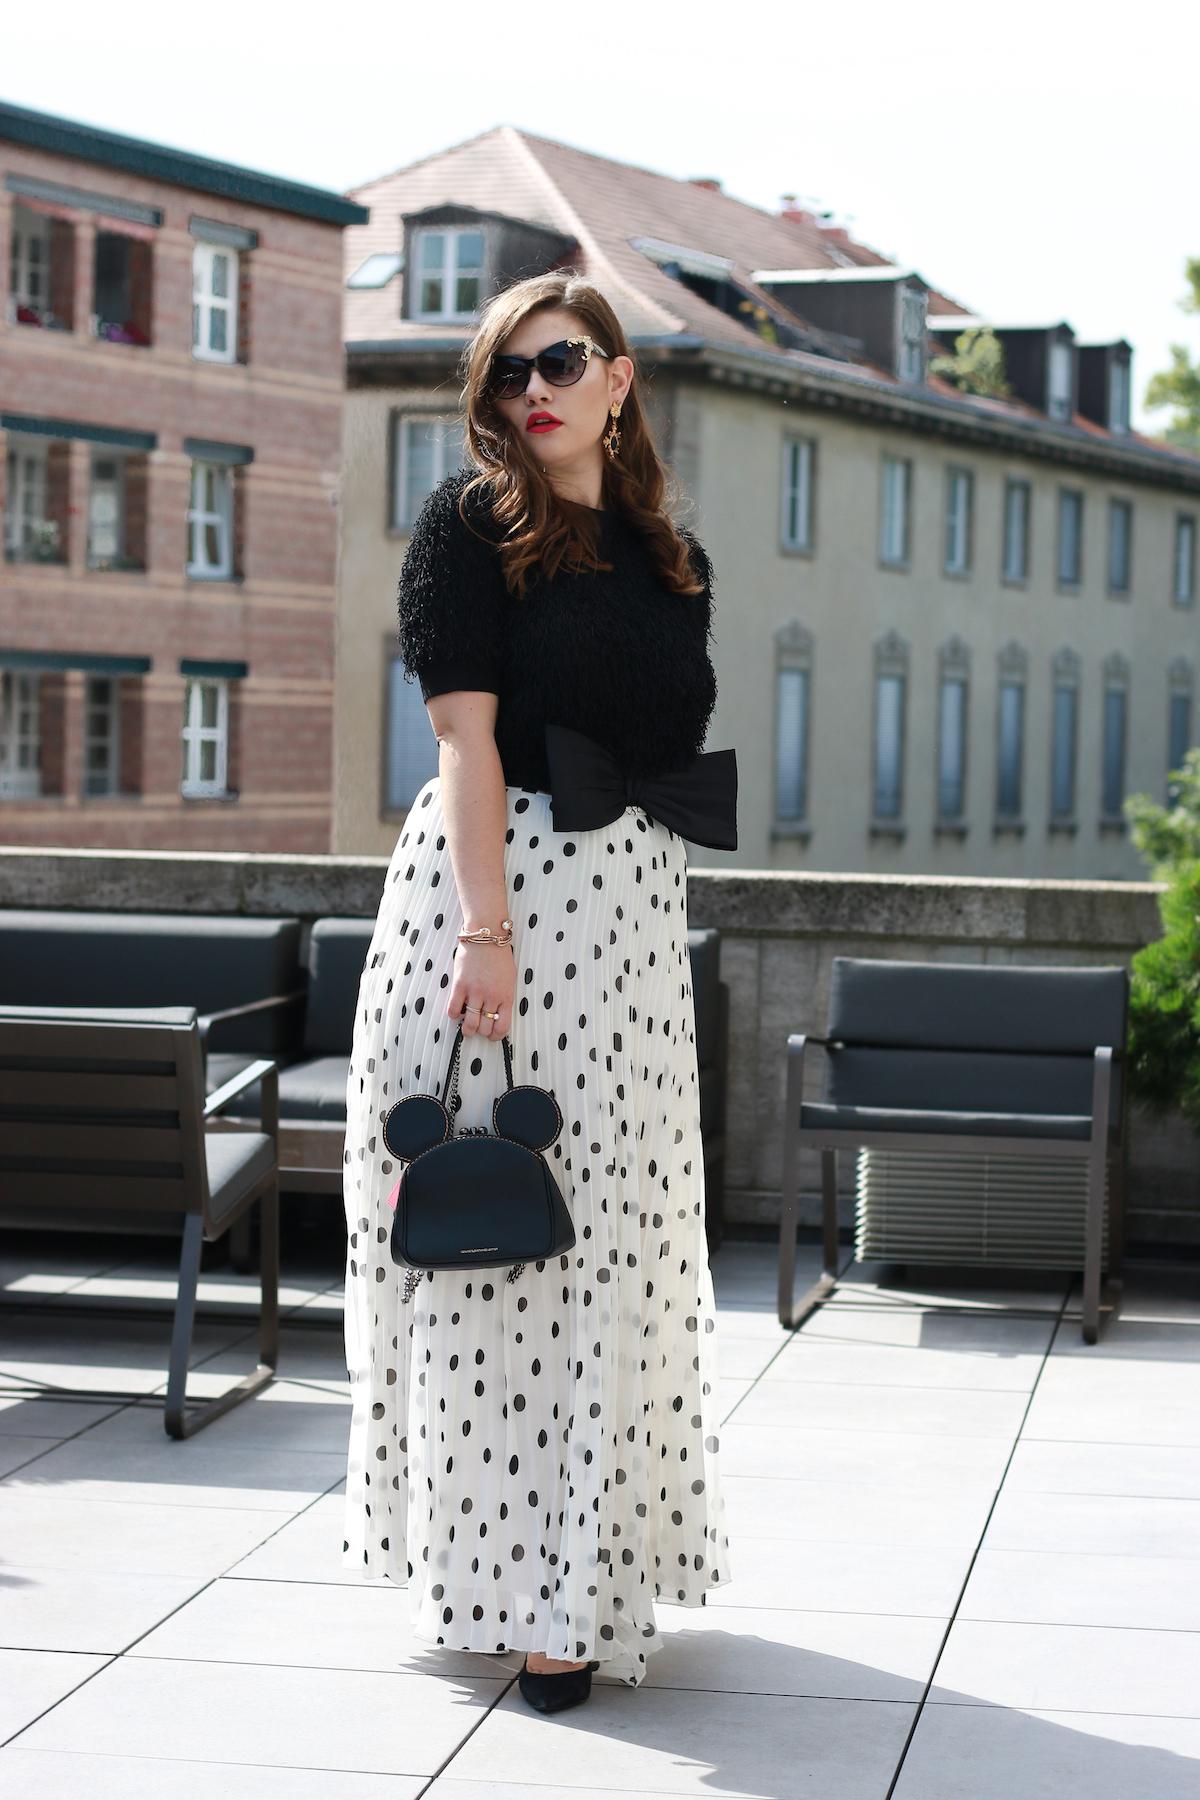 sara-bow-schwarz-weiss-outfit-berlin-fashionweek-coach-tasche